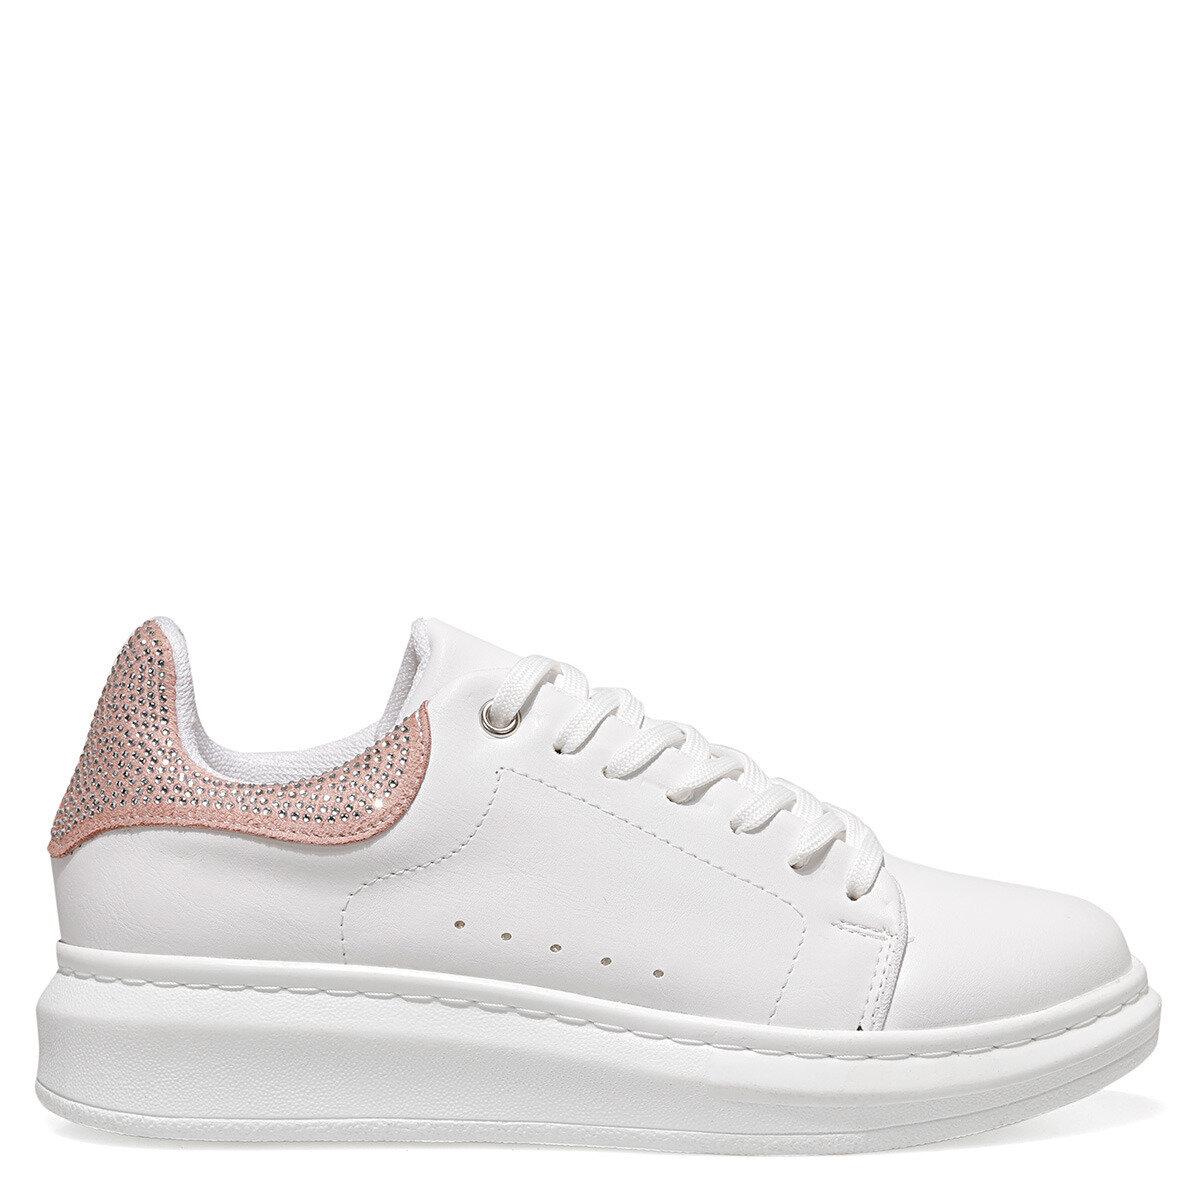 LORIS Pudra Kadın Spor Ayakkabı